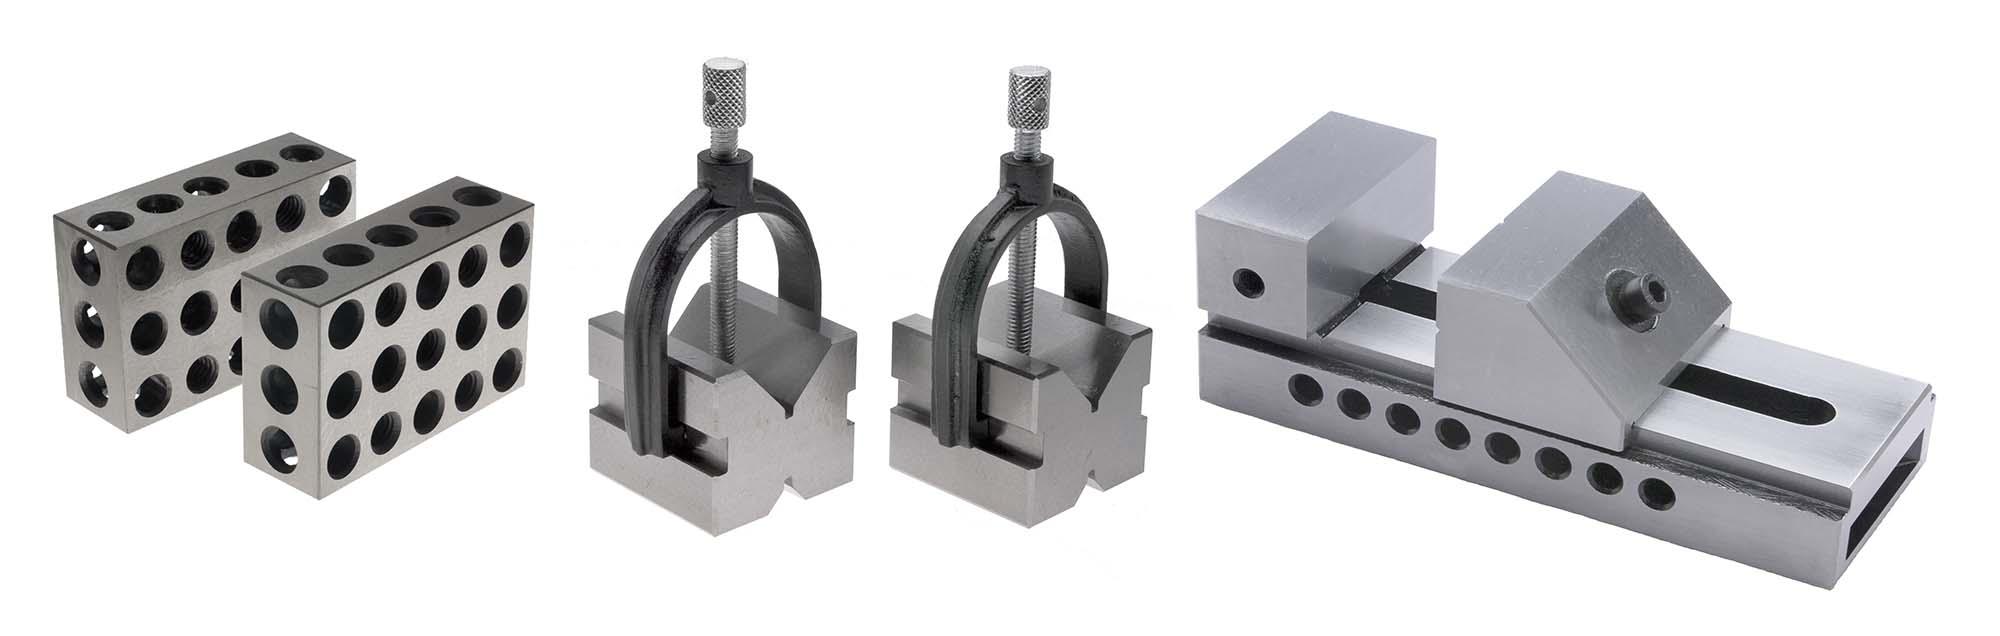 VME Set-up Tool Set: BL-123 Blocks, VS-SLV2A Vise, and VB-2 Vee Blocks